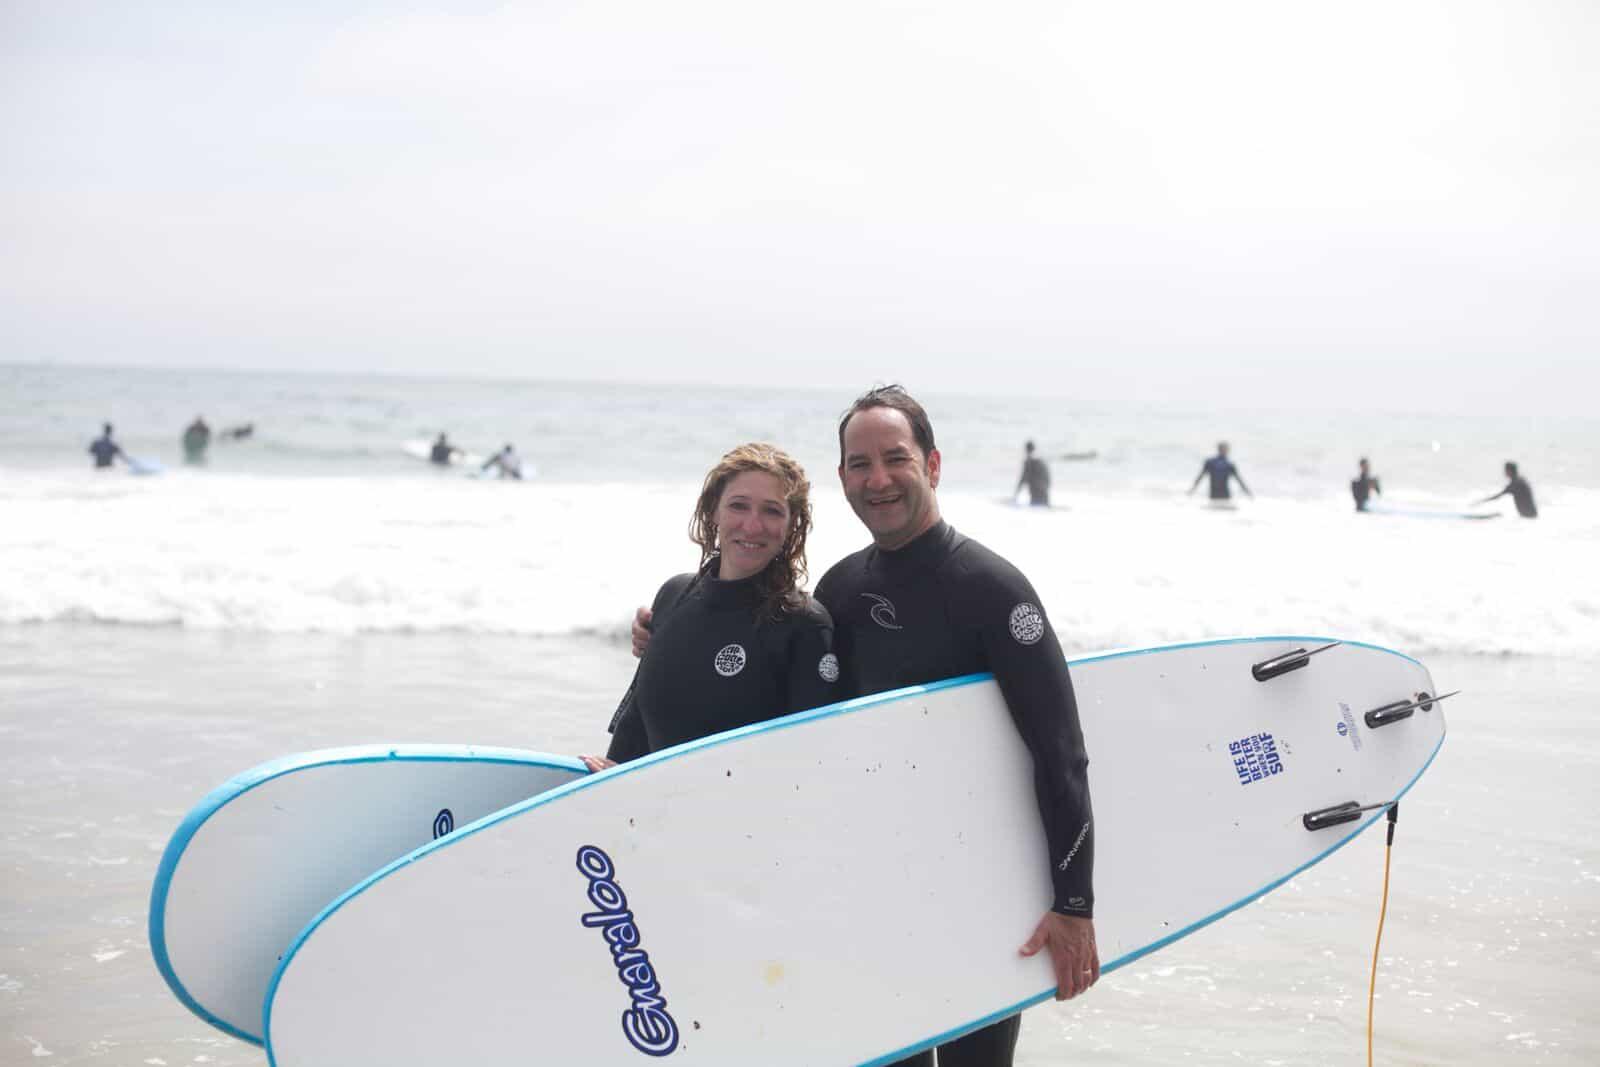 Surf Lessons in Santa Barbara 2 people - Cal Coast Adventures